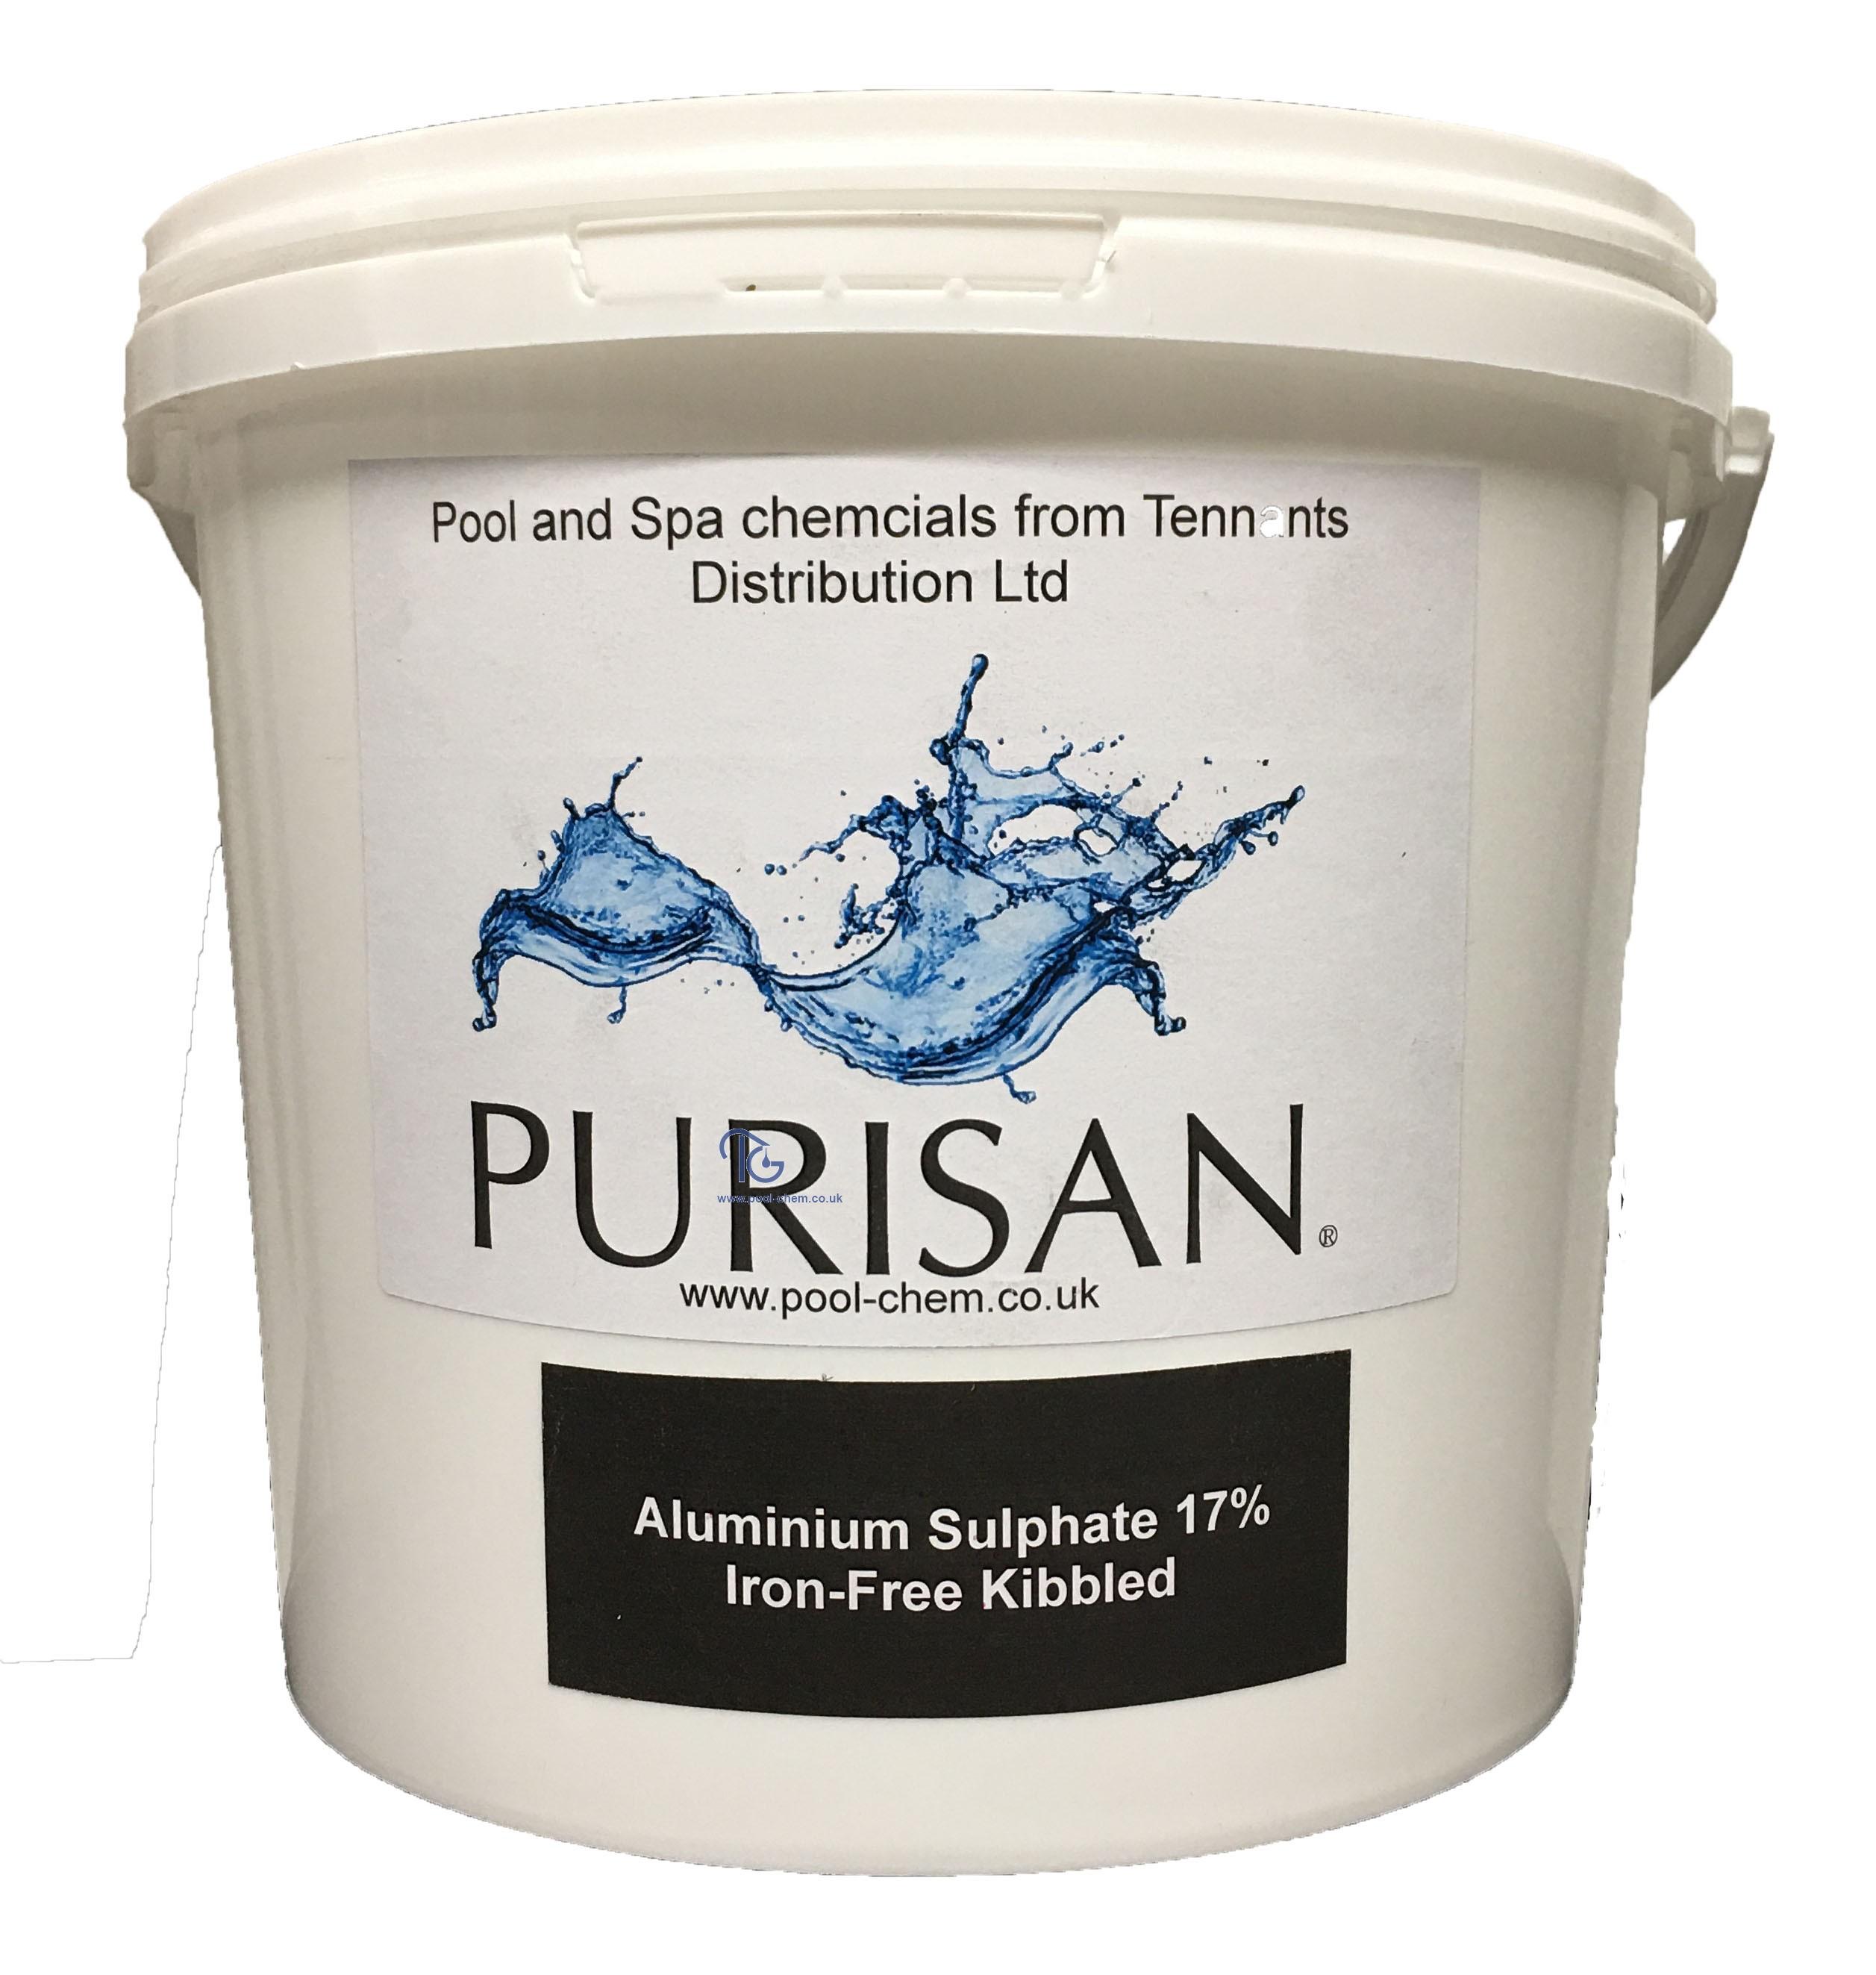 Purisan® Aluminium Sulphate 17% Iron-Free Kibbled (4 x 5 Kg)